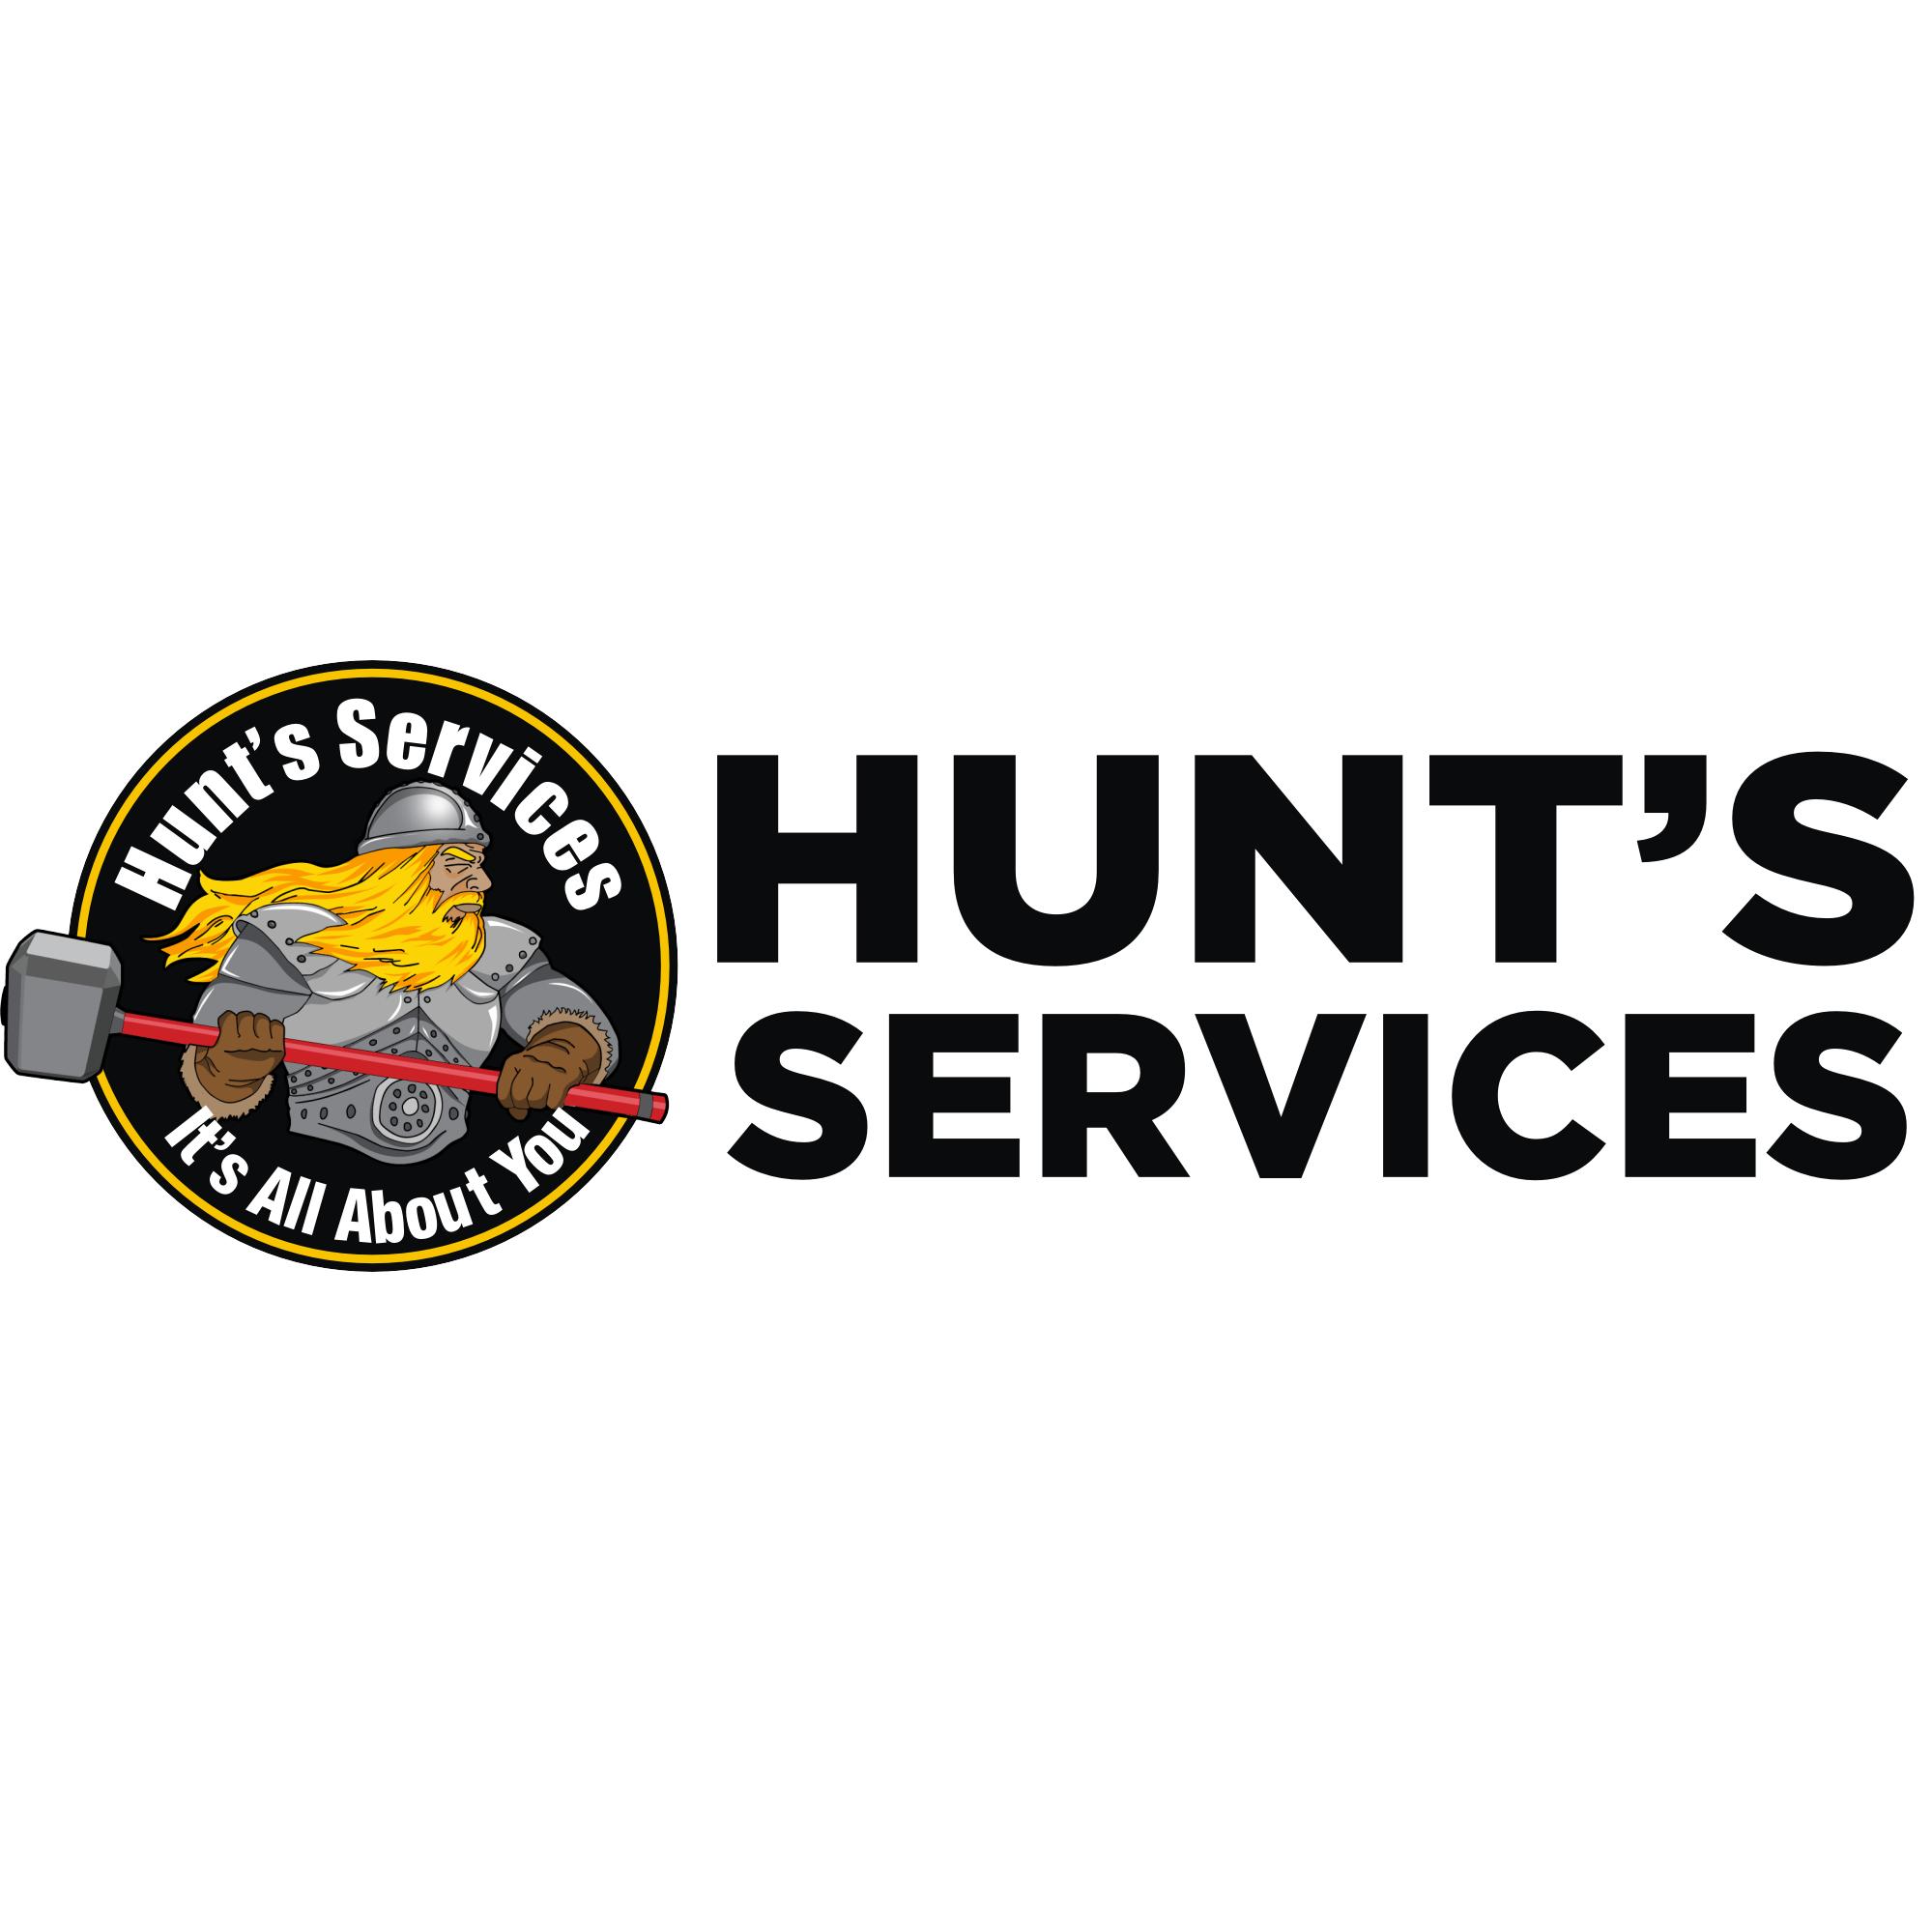 Hunts Services